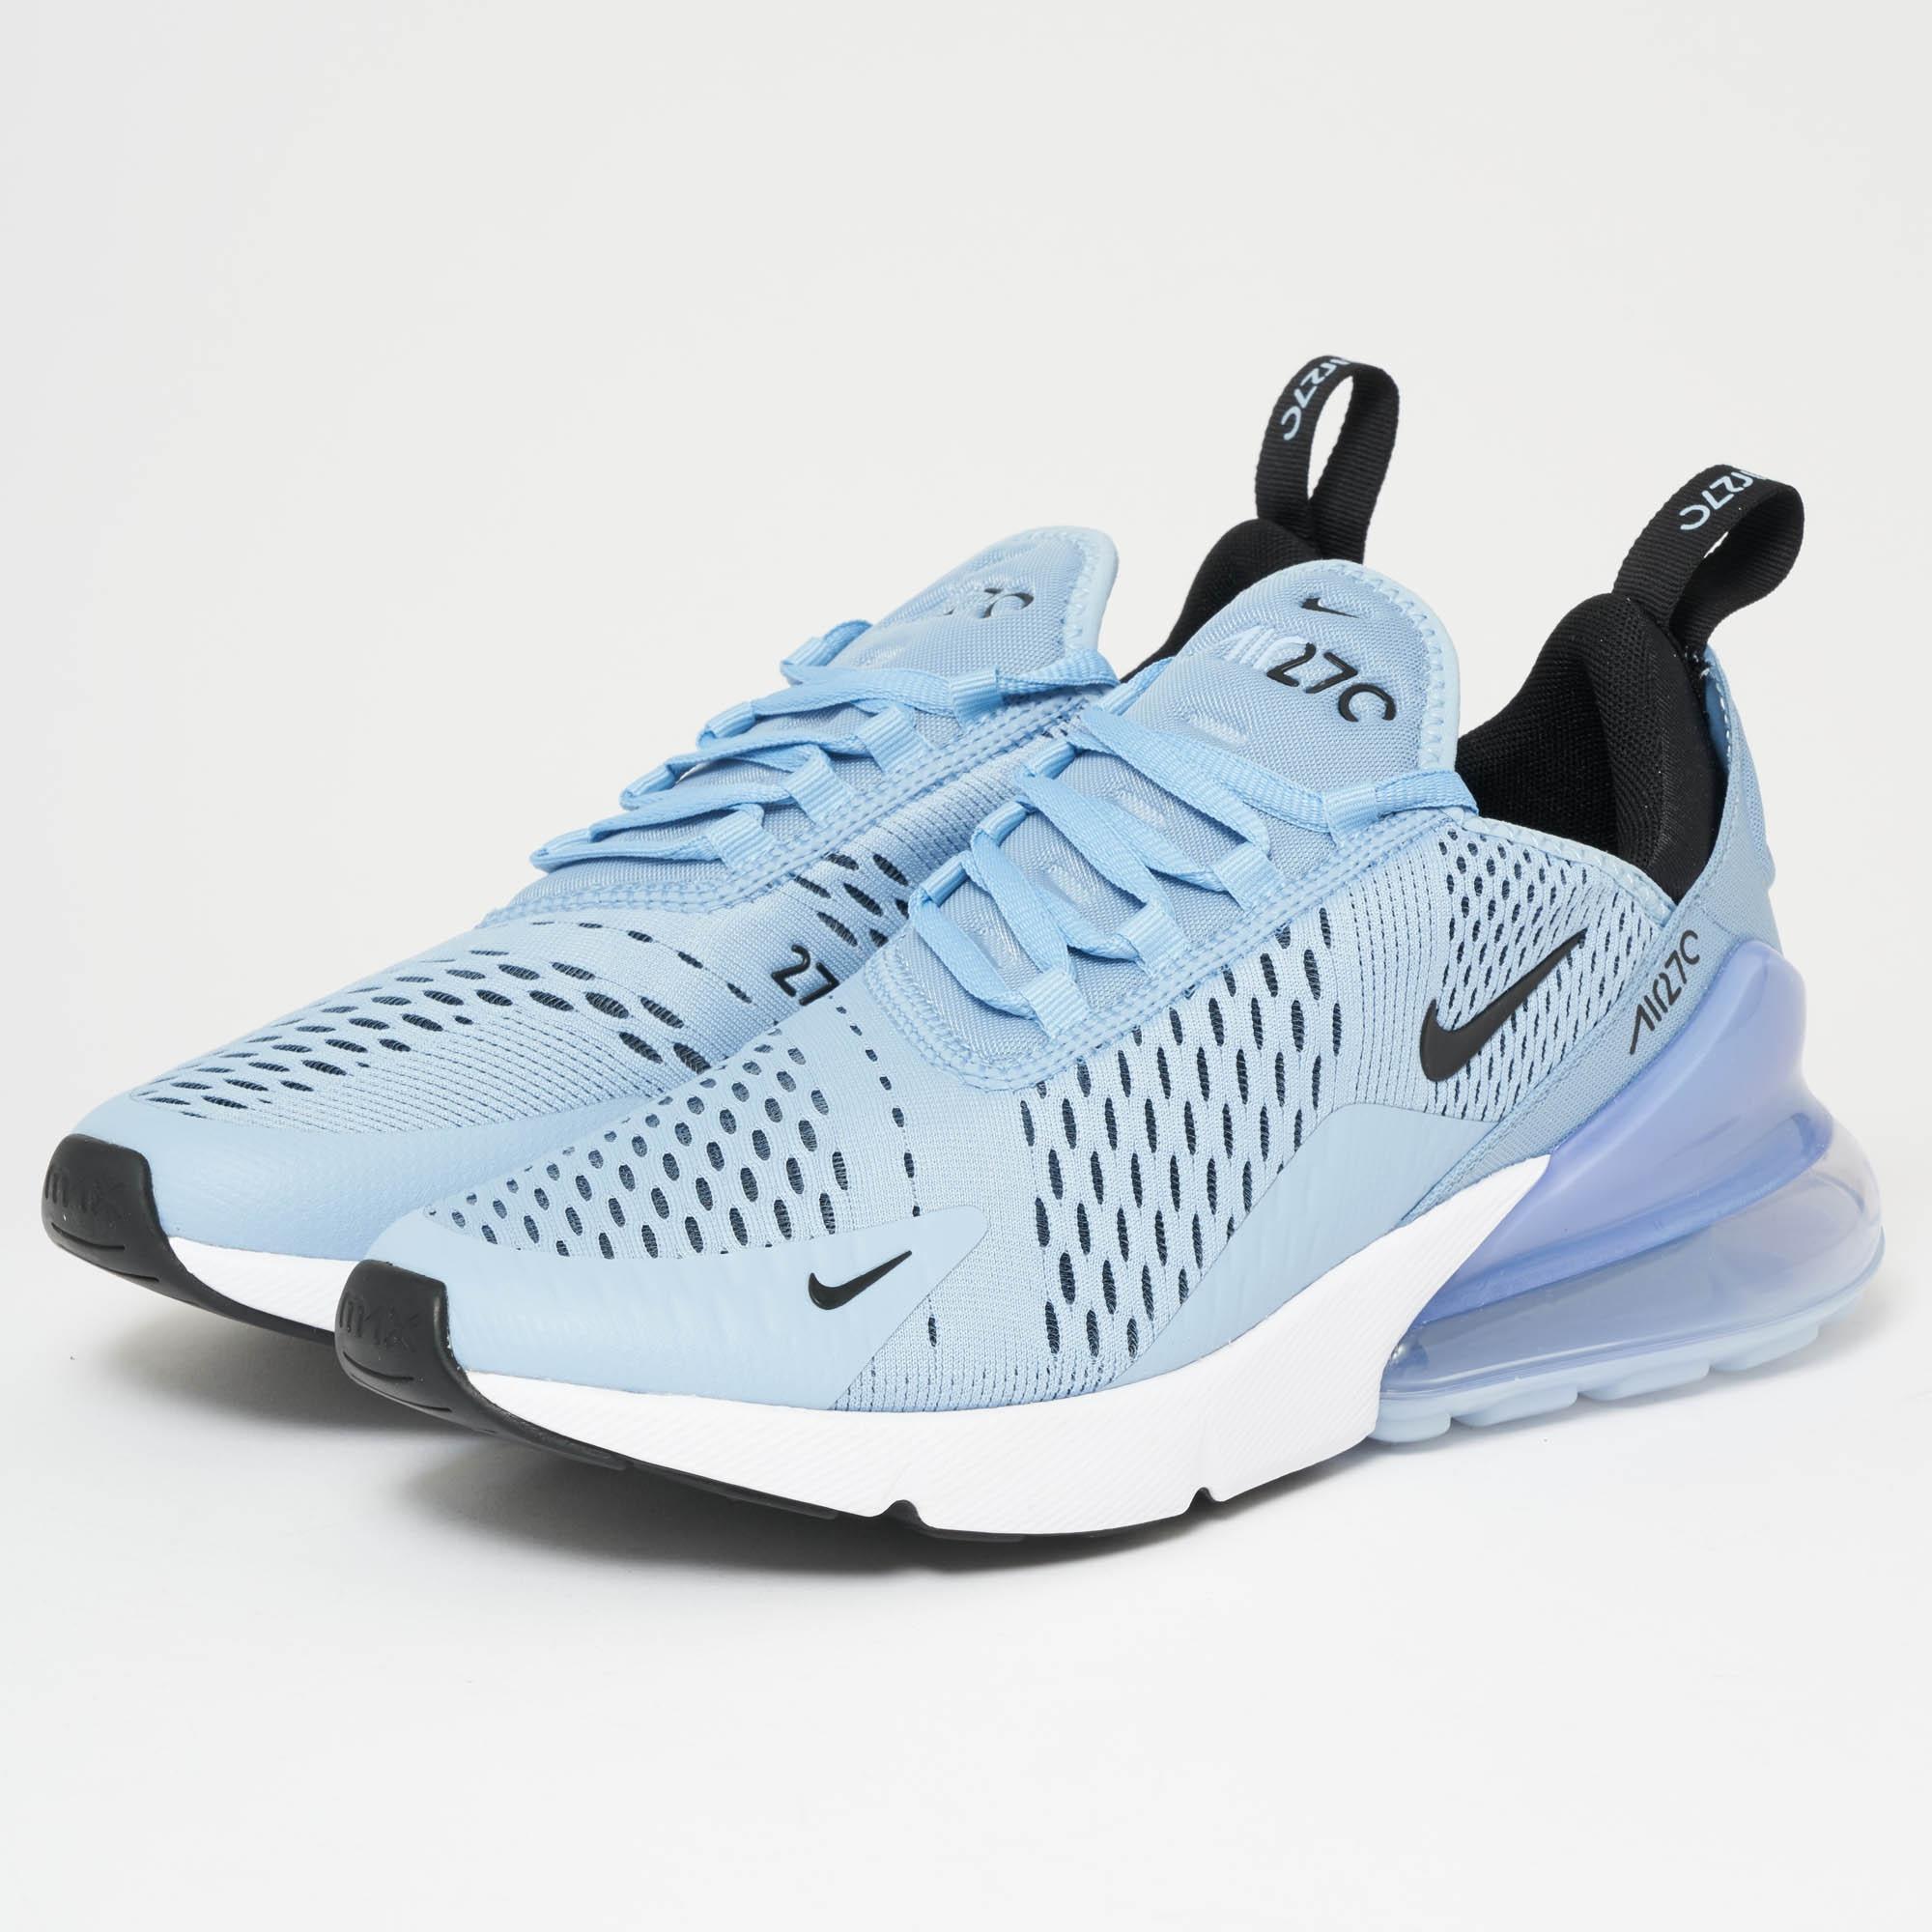 best sneakers 4f874 e97ce ... cheap lyst nike air max 270 leche blue black white in blue for men  651b4 c44f8